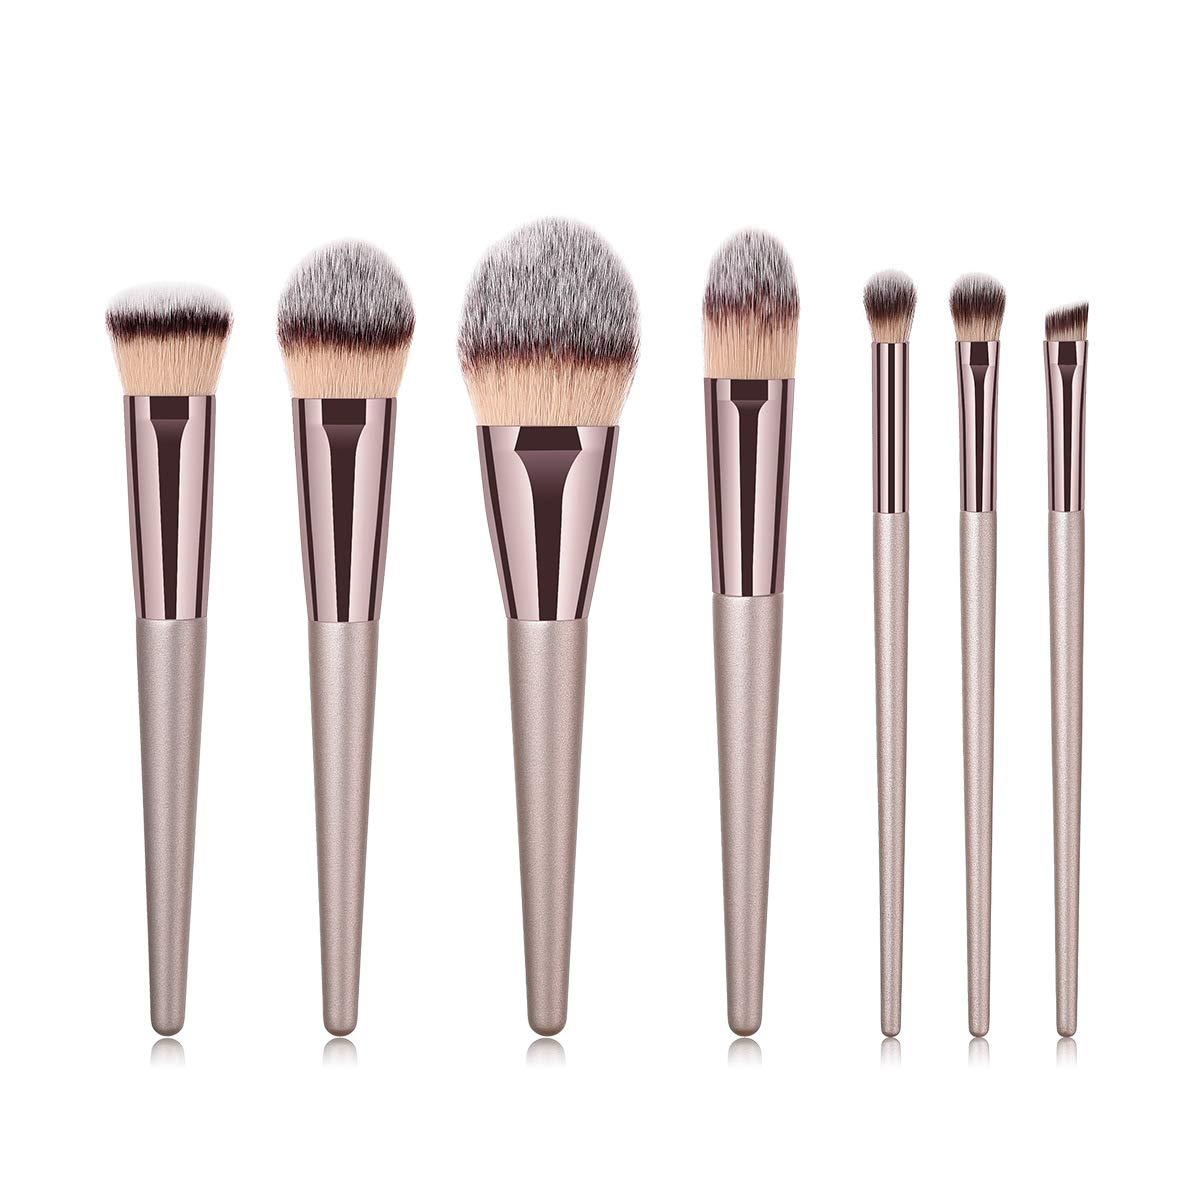 BBL 7pcs Luxury Champagne Gold Makeup Brushes Set, Premium Synthetic Hair Cosmetic Brushes for Foundation Blending Powder Liquid Cream Eyeshadow Eyebrow Blush Nose Shading Professional